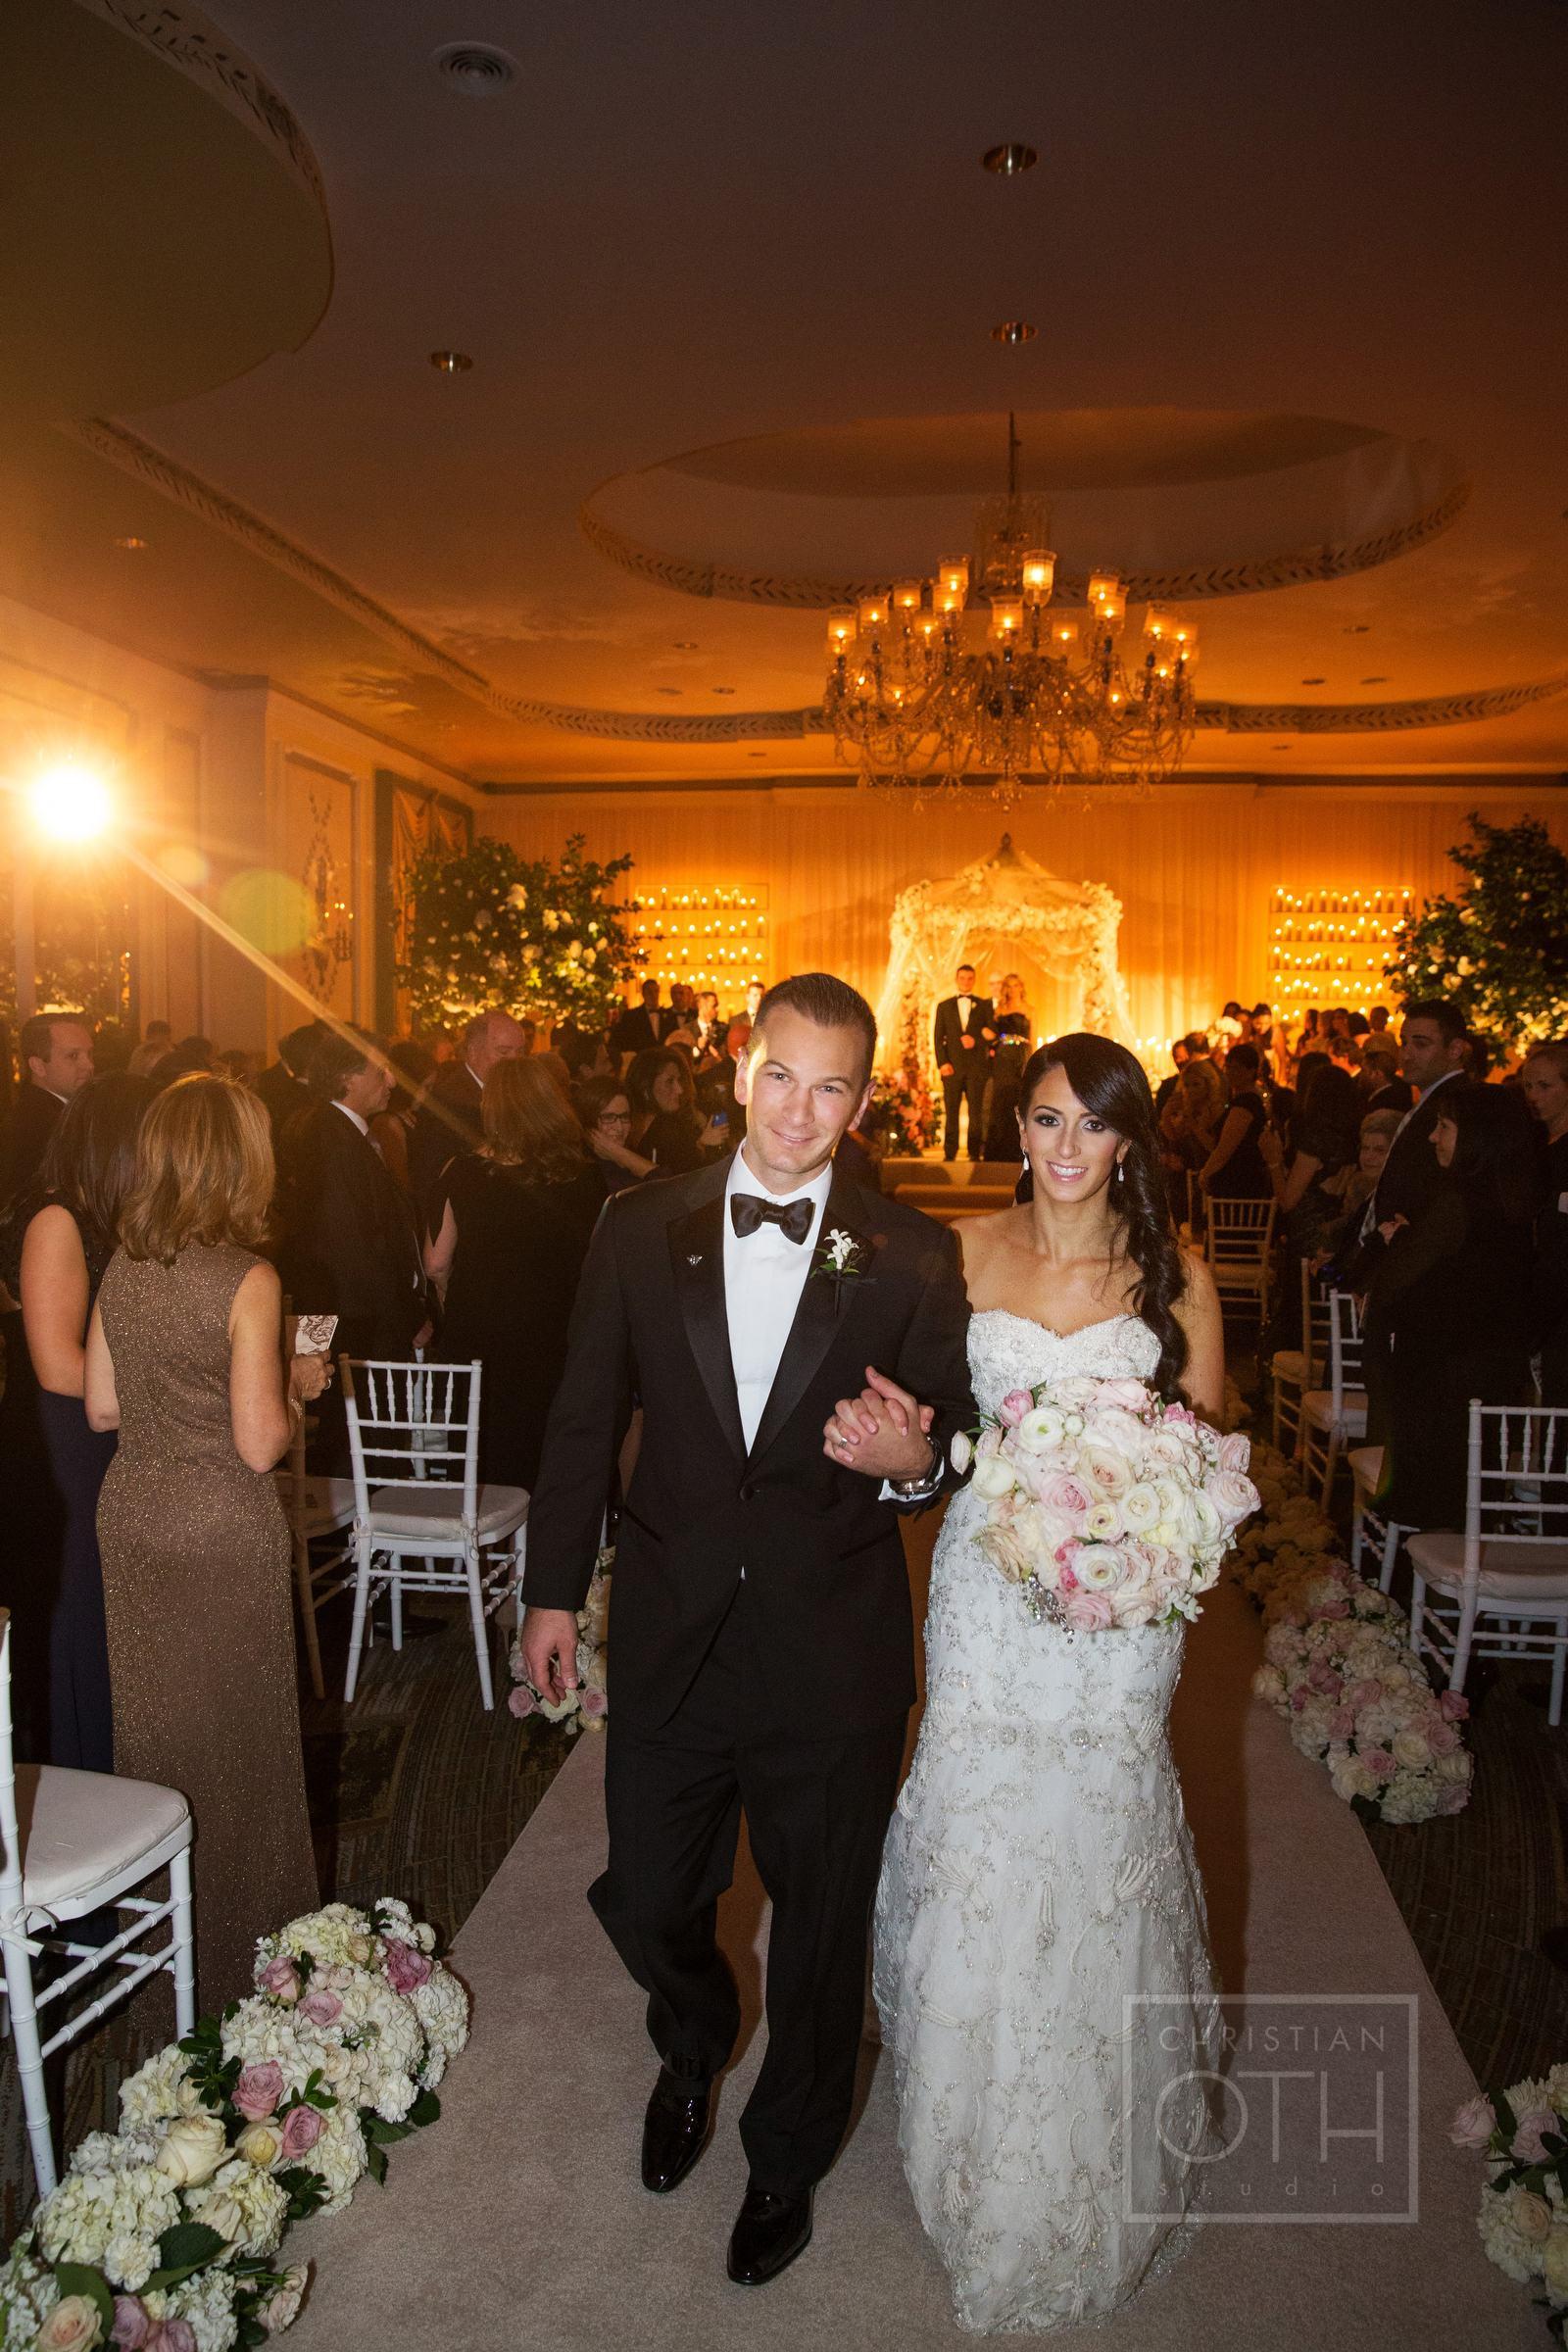 Ceci_New_York_Custom_Invitation_Pierre__City_ Destination_Wedding_Luxury_Personalized_Ceci_Style_Bride_Rose_Gold_Foil_Stamping112.JPG